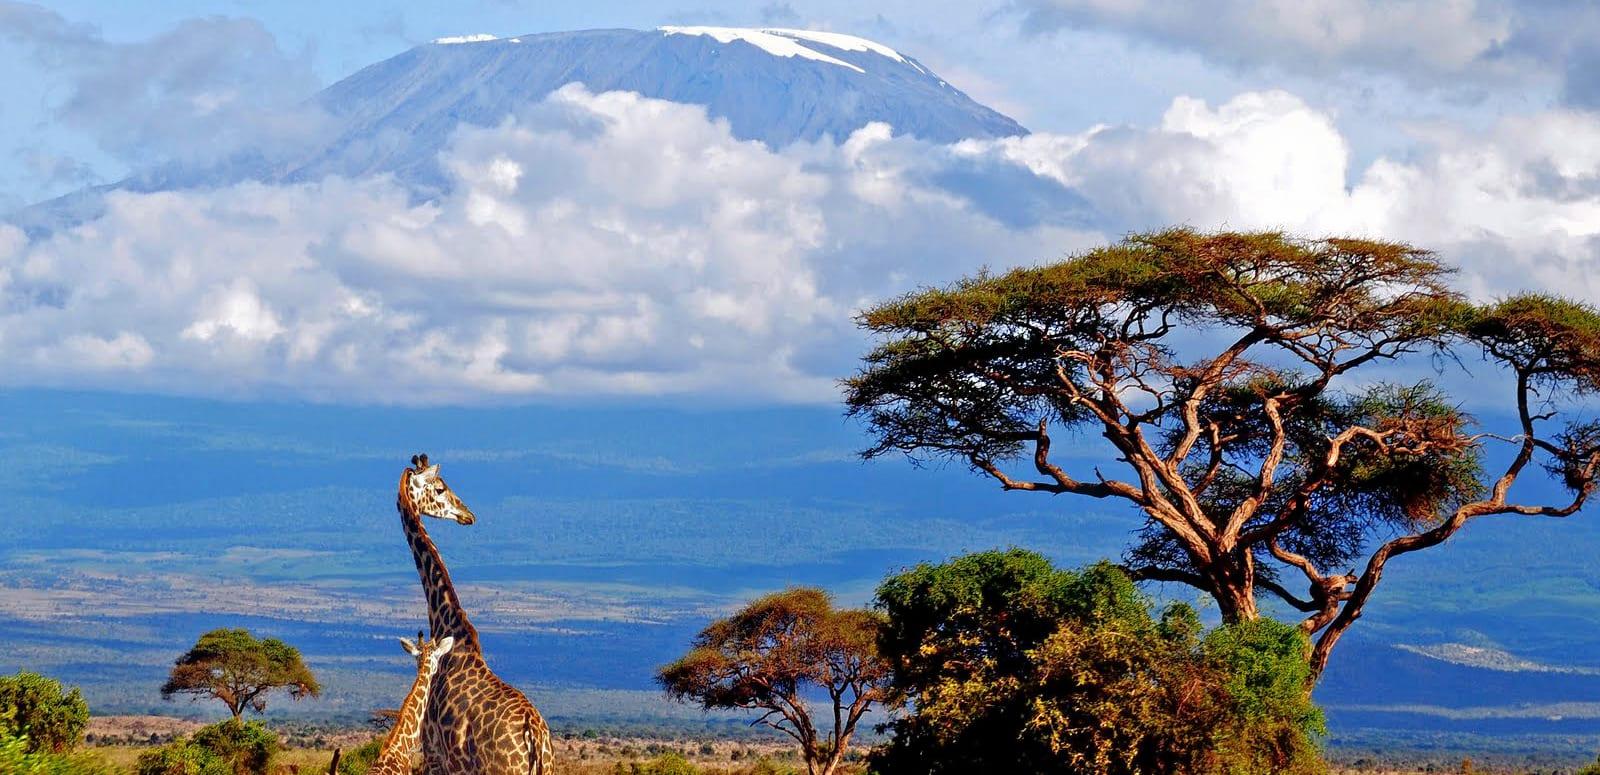 1574493548_tanzania_safari.jpg